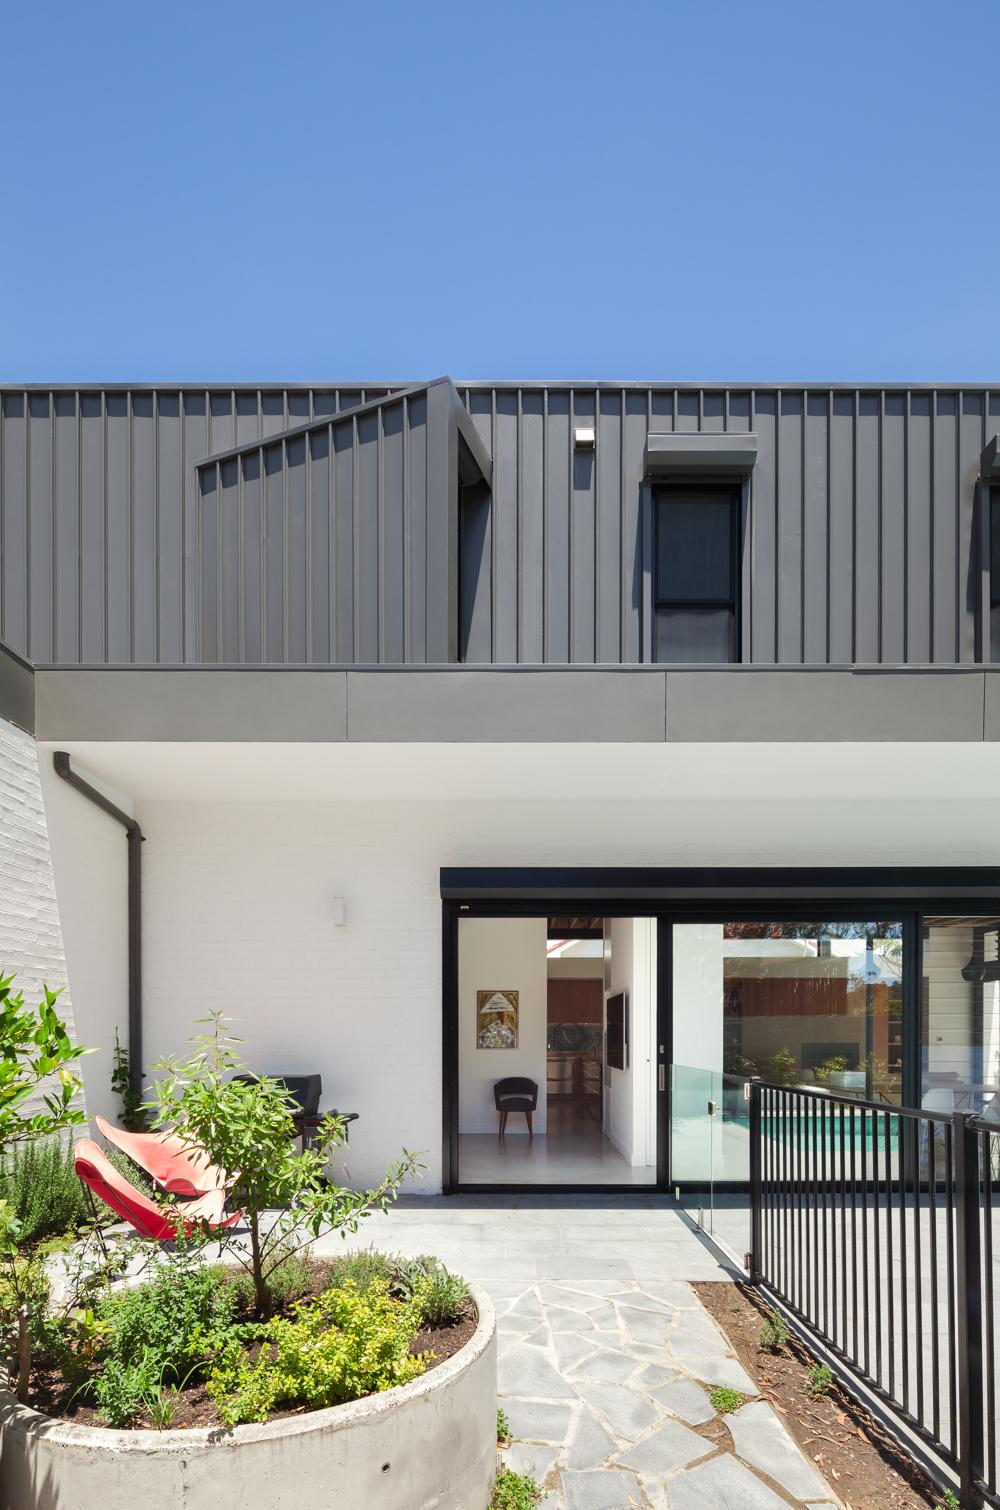 turramurra-house=noxon-giffen-architects-the-design-emotive--13.jpg